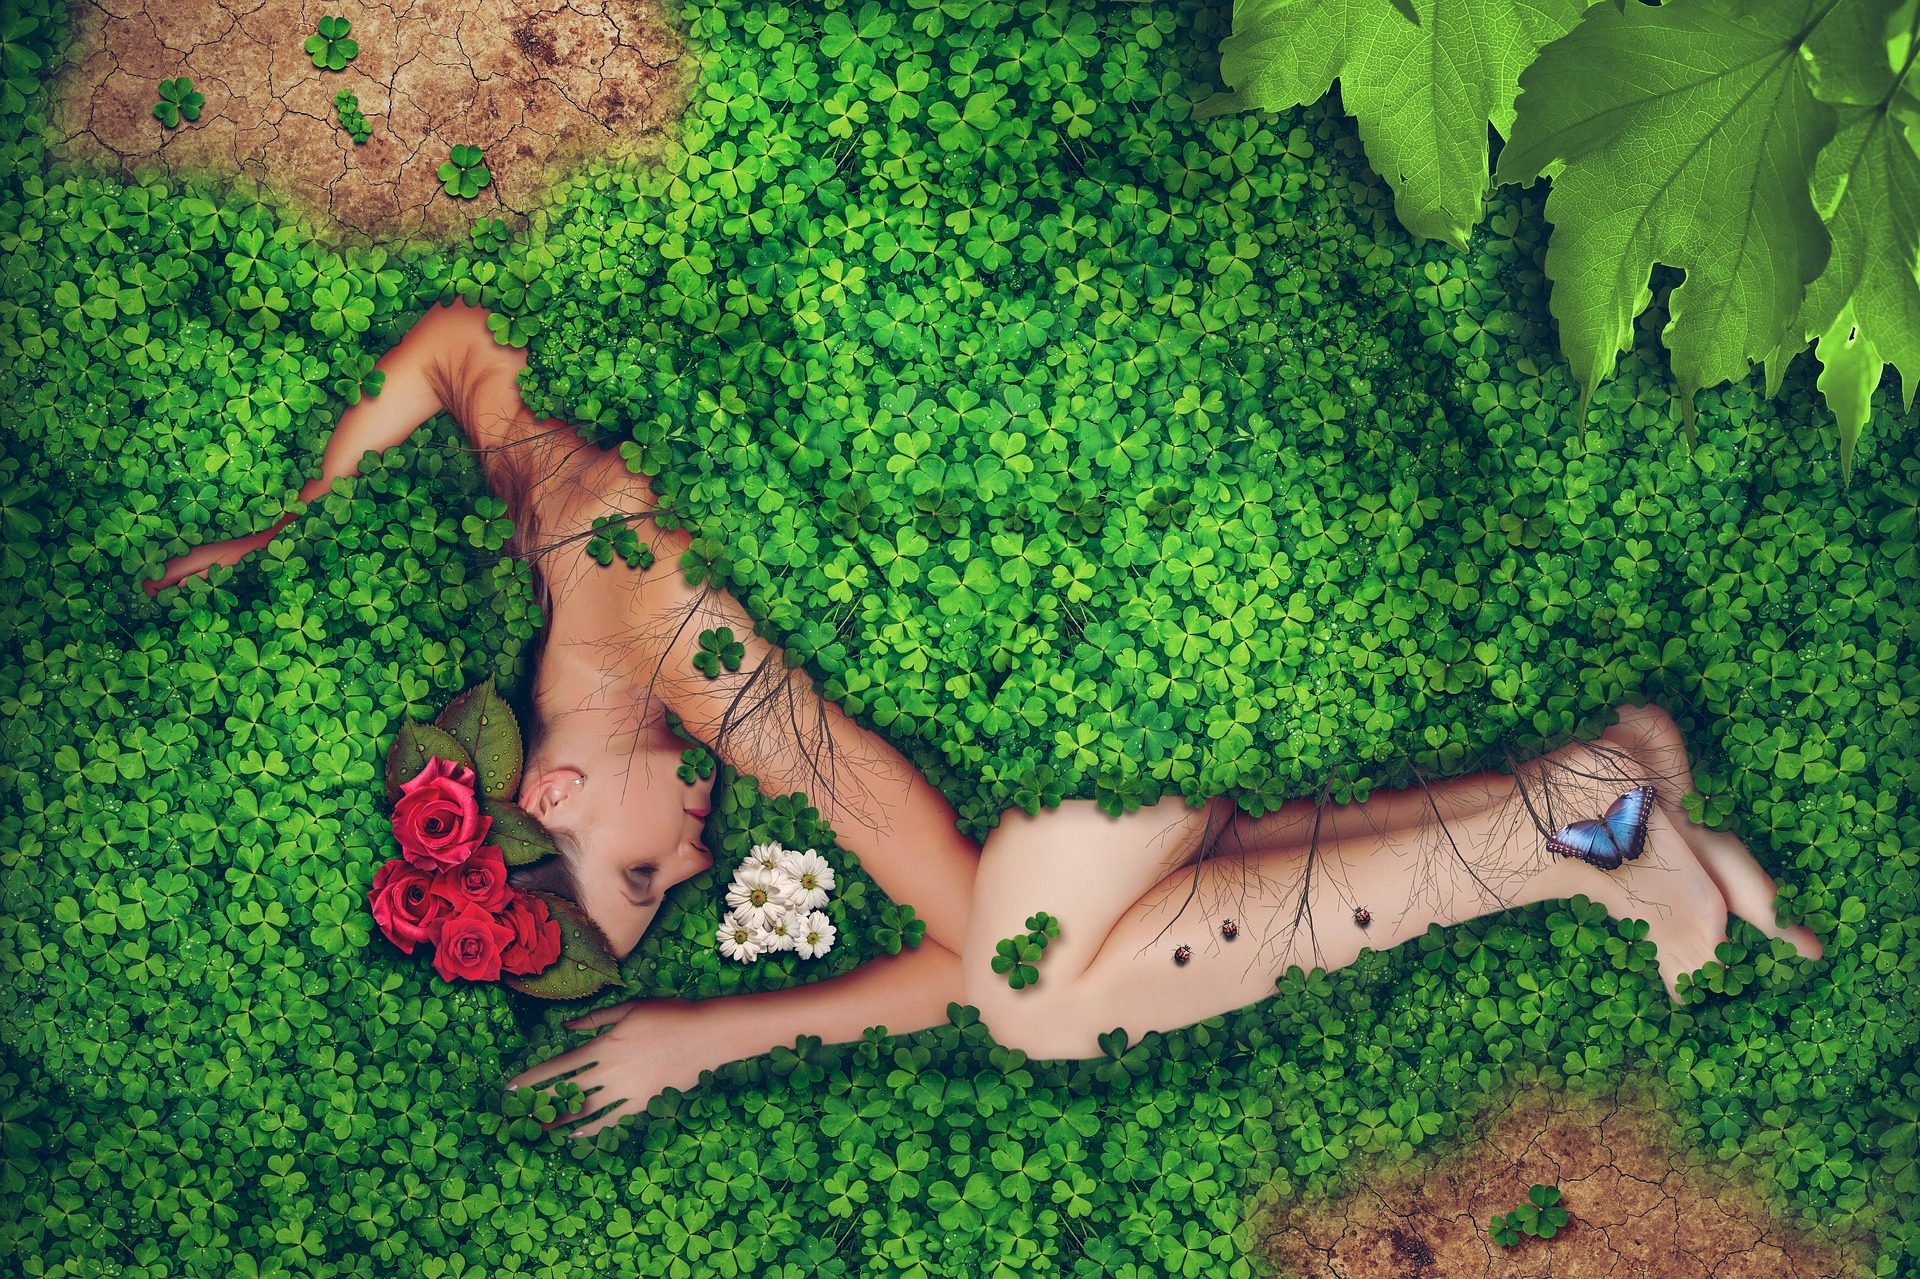 महिला, tréboles, फूल, प्रकृति, mariposa - HD वॉलपेपर - प्रोफेसर-falken.com